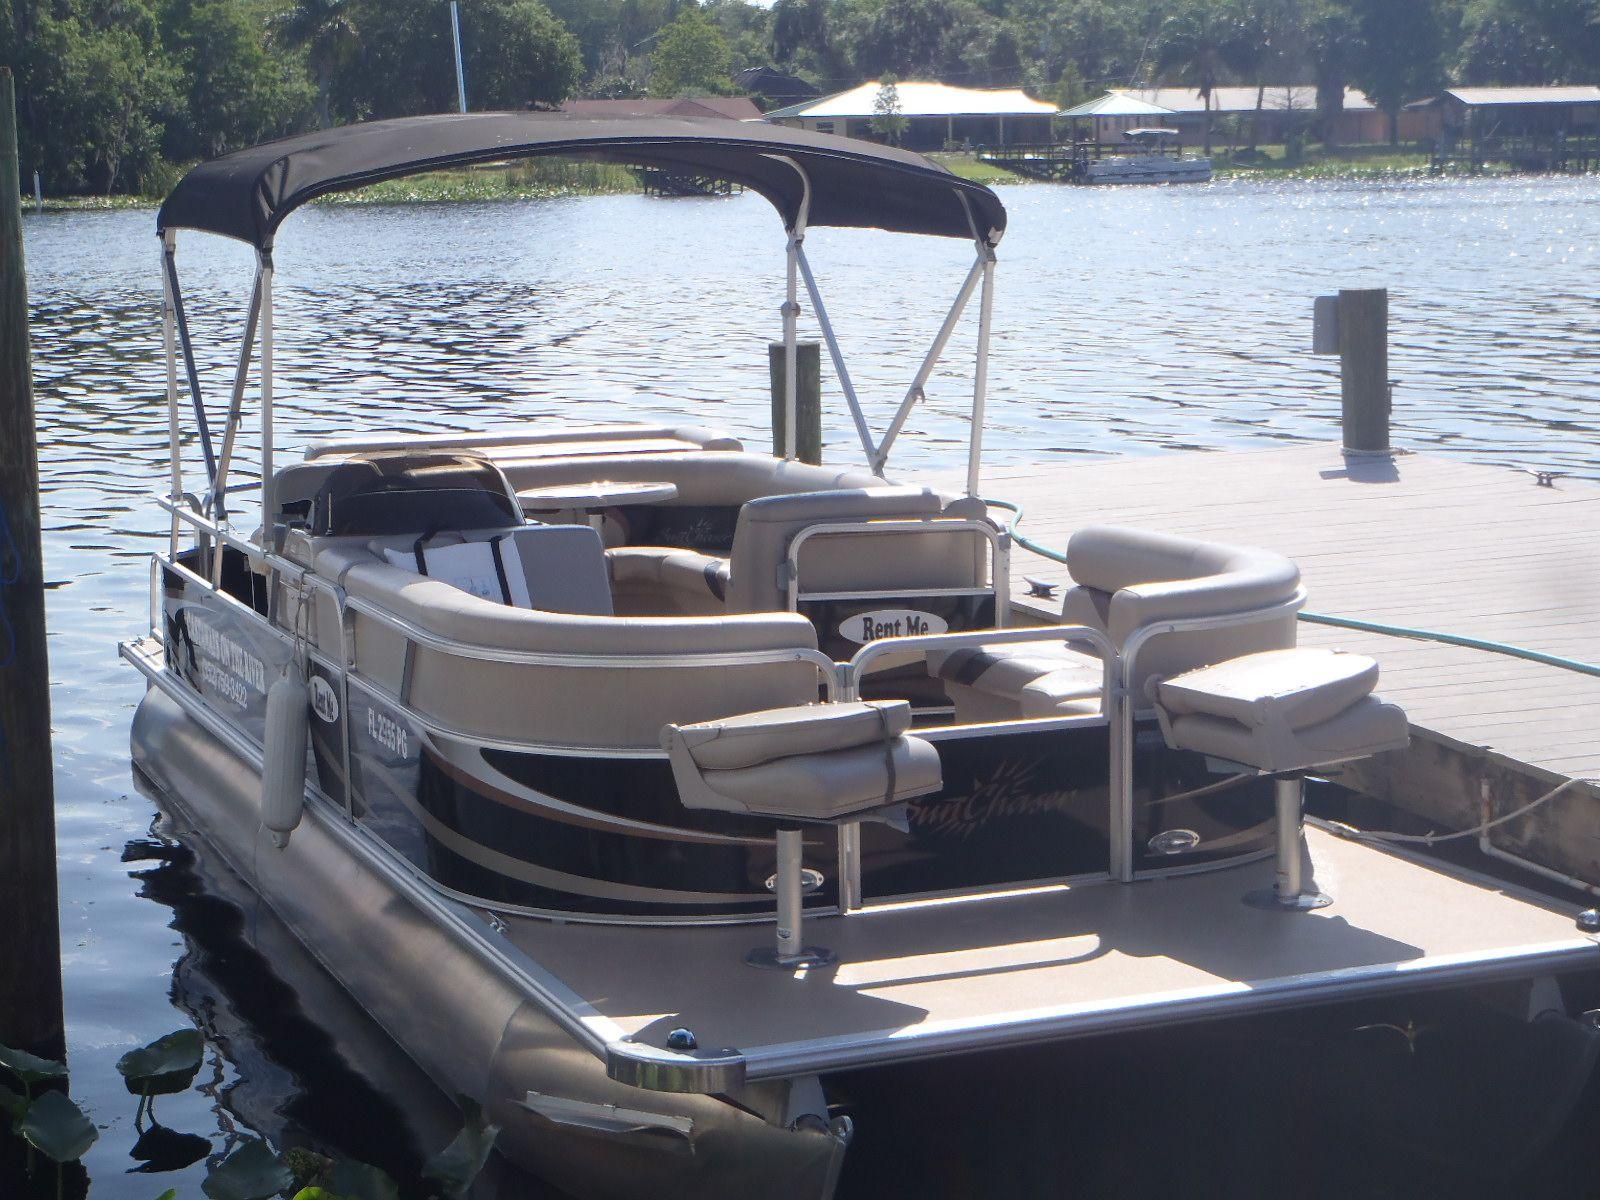 Grady pontoon boat rental boat rental boat pontoon